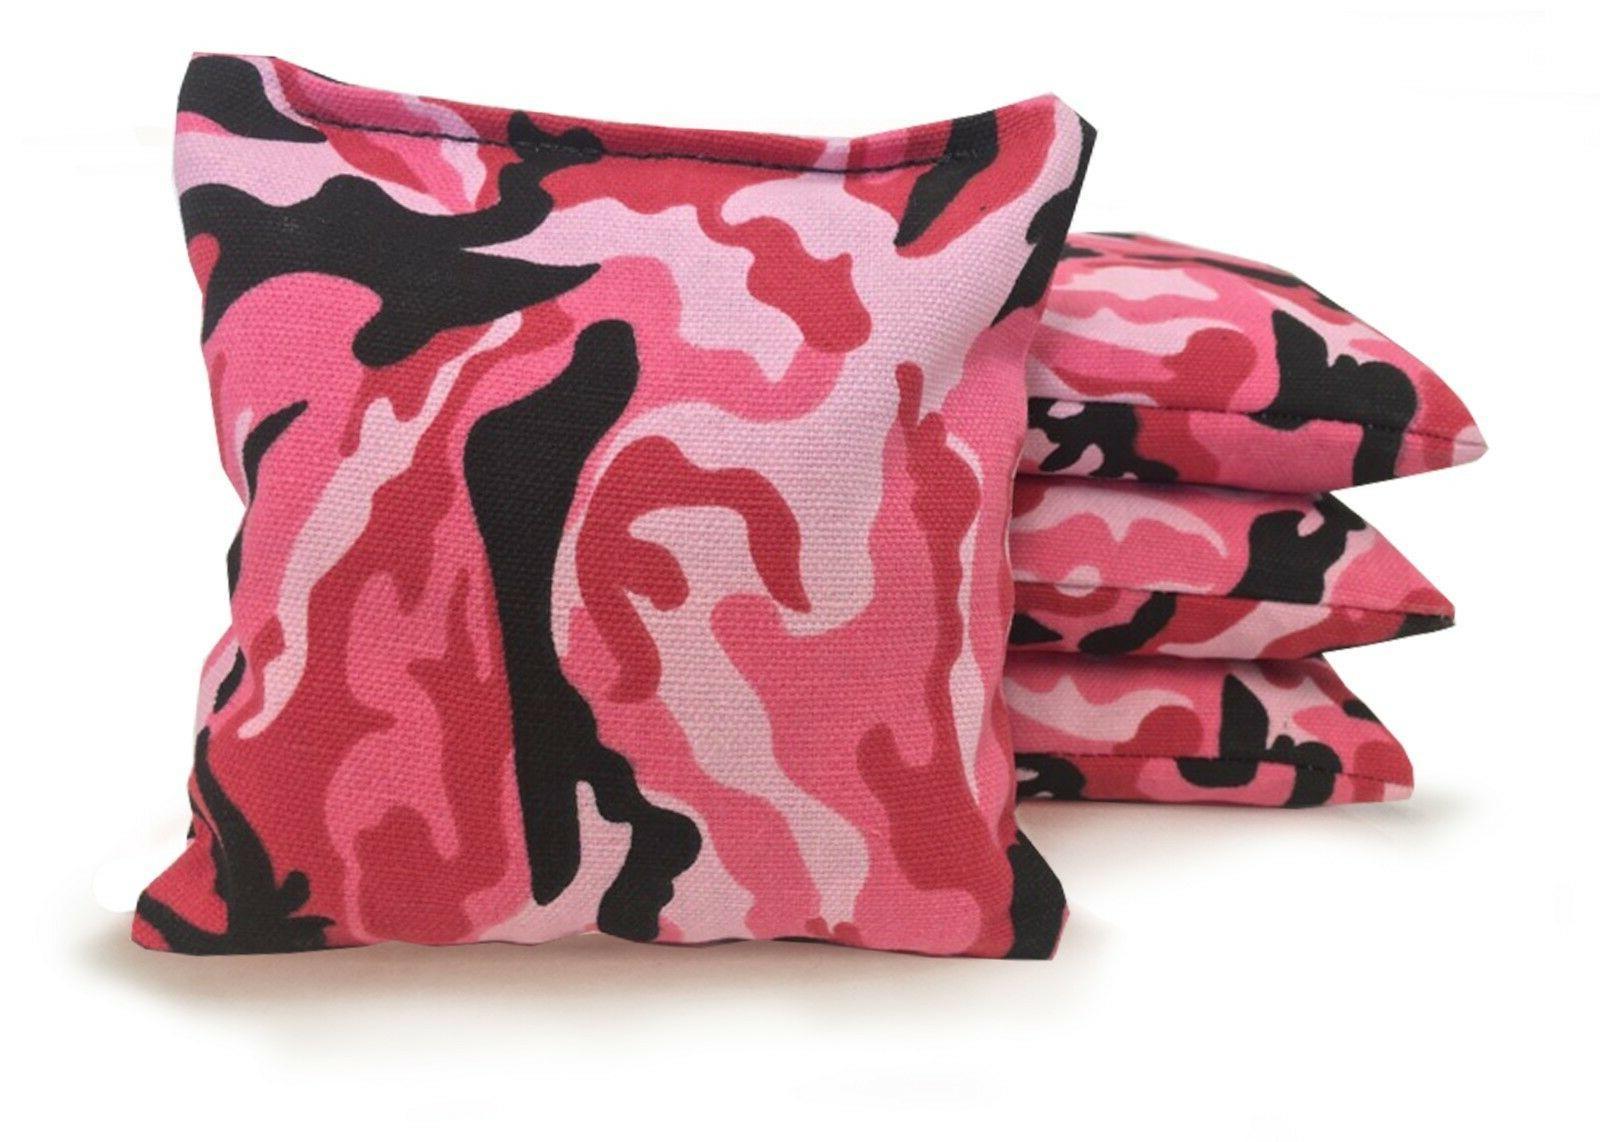 Set of Cornhole Bags - 25 Colors -High - Corn Filled